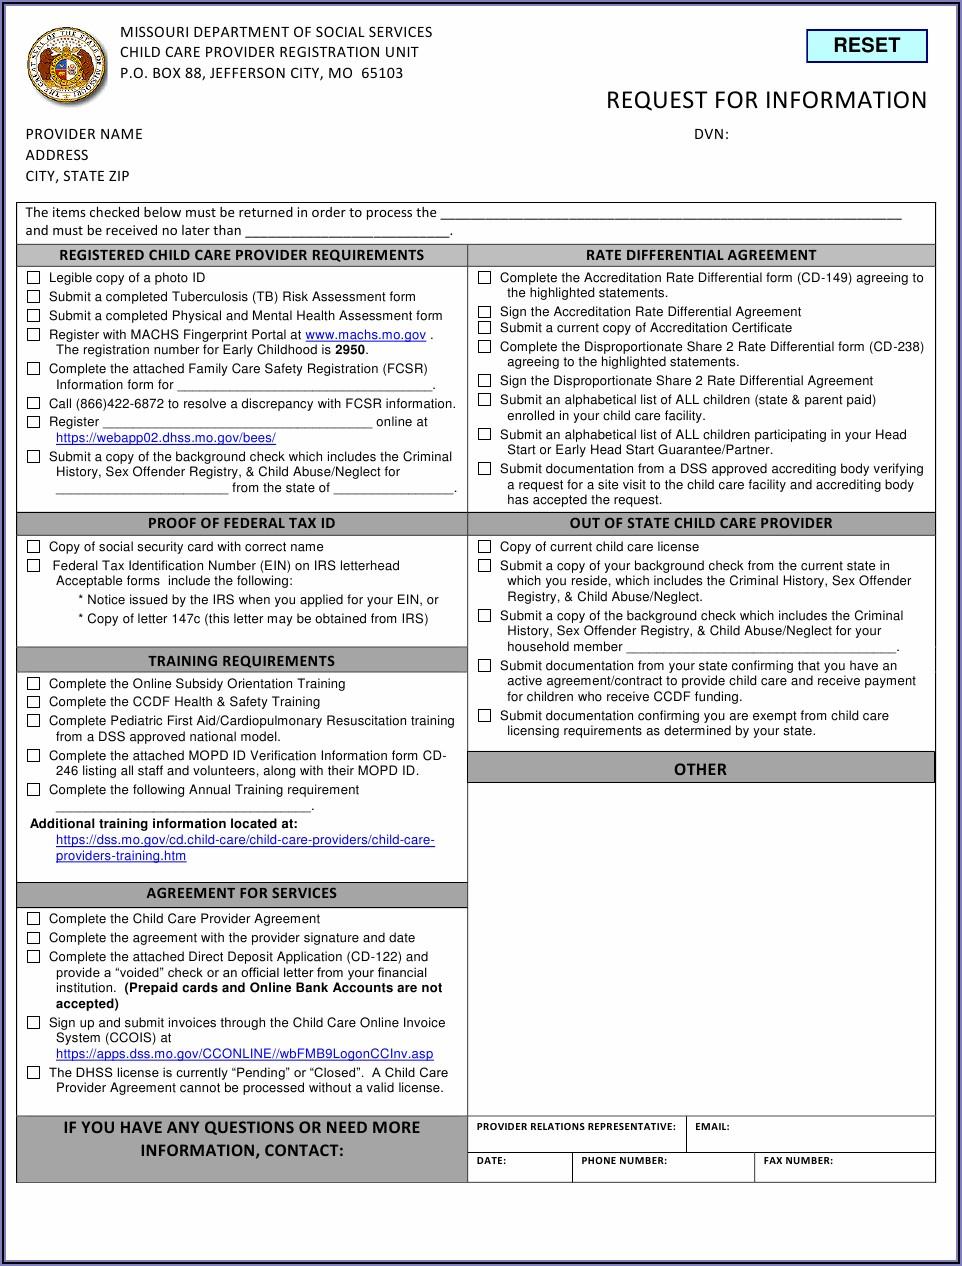 Dss.mo.gov Childcare Invoice